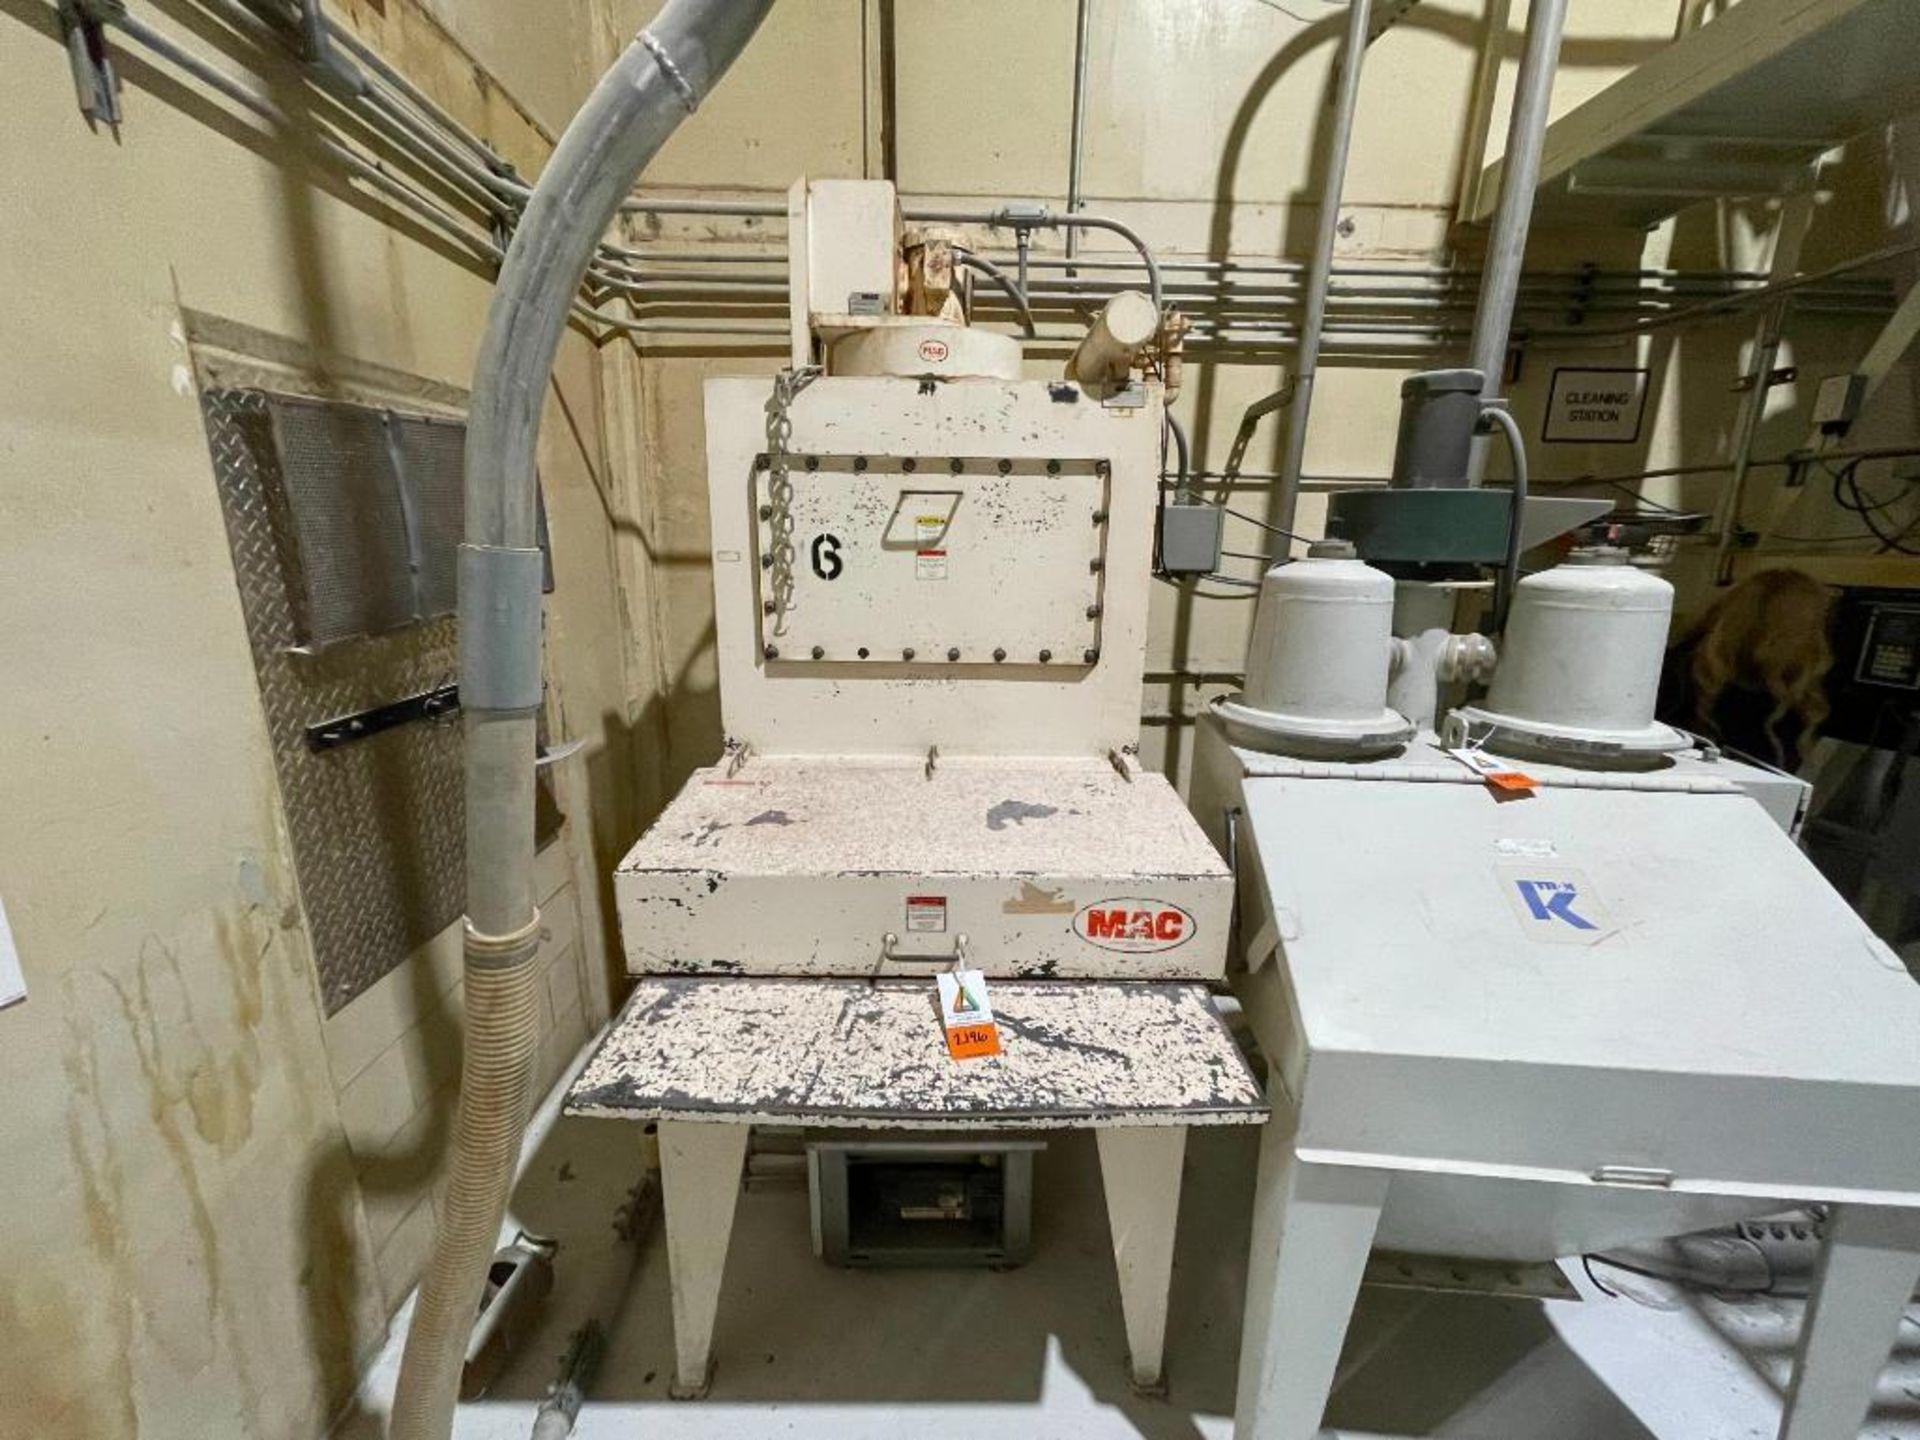 MAC dry ingredients dump station